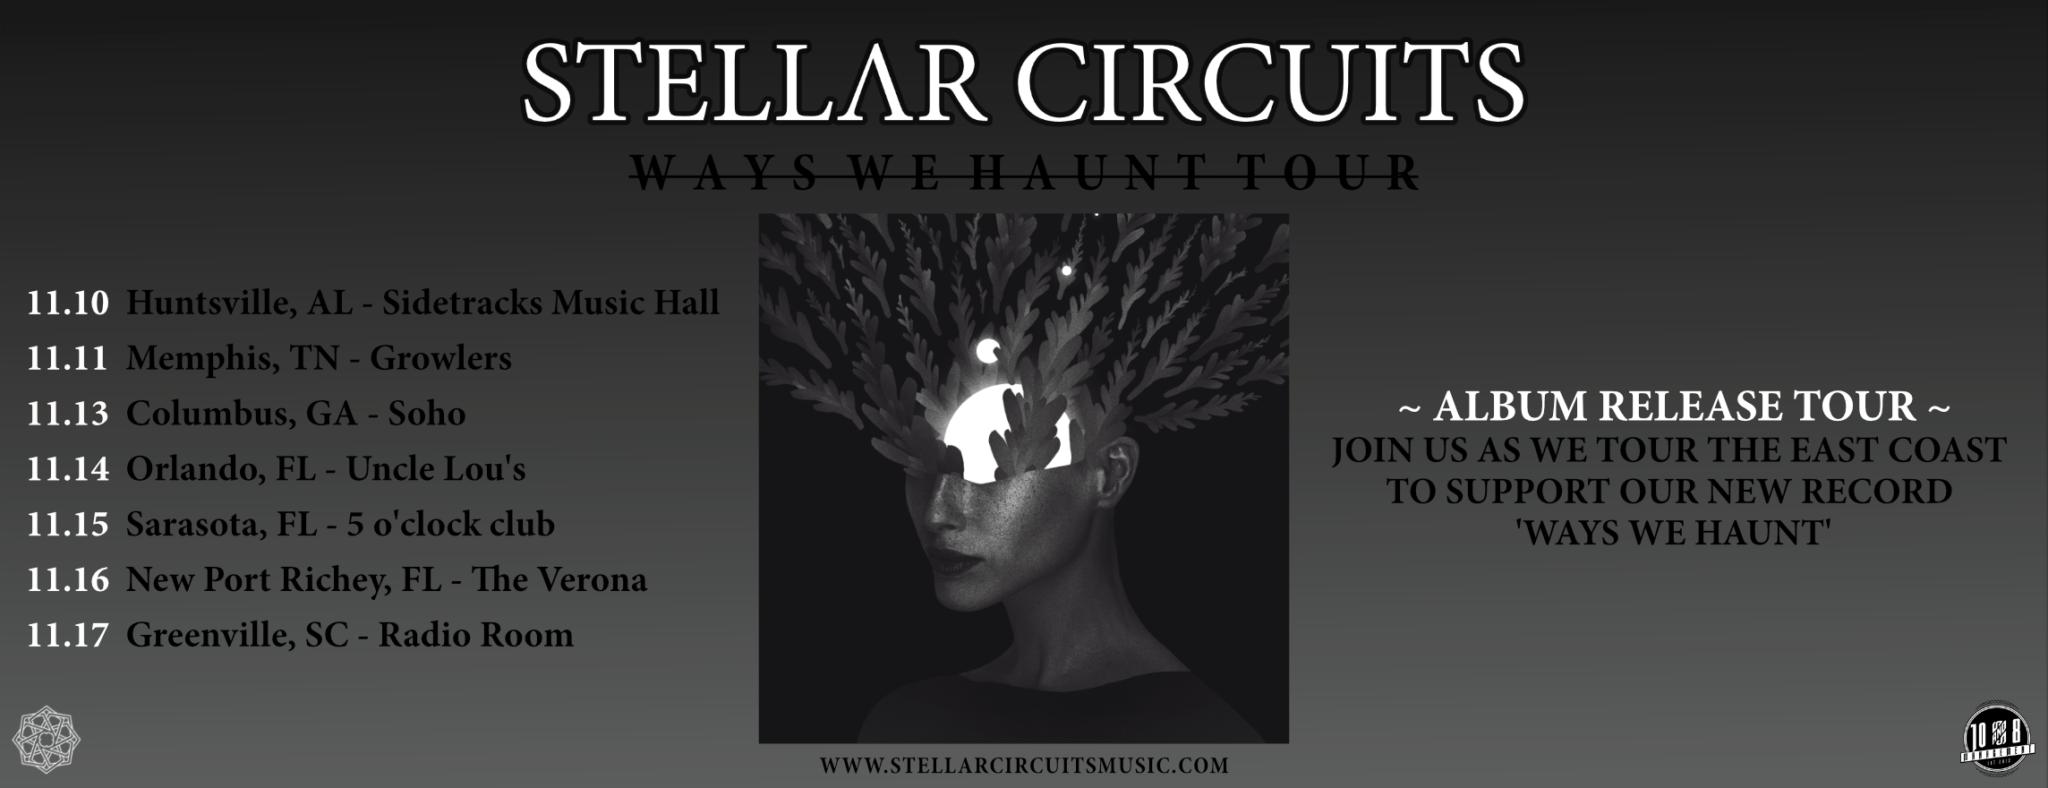 Stellar Circuits Reveal Stunning Music Video For